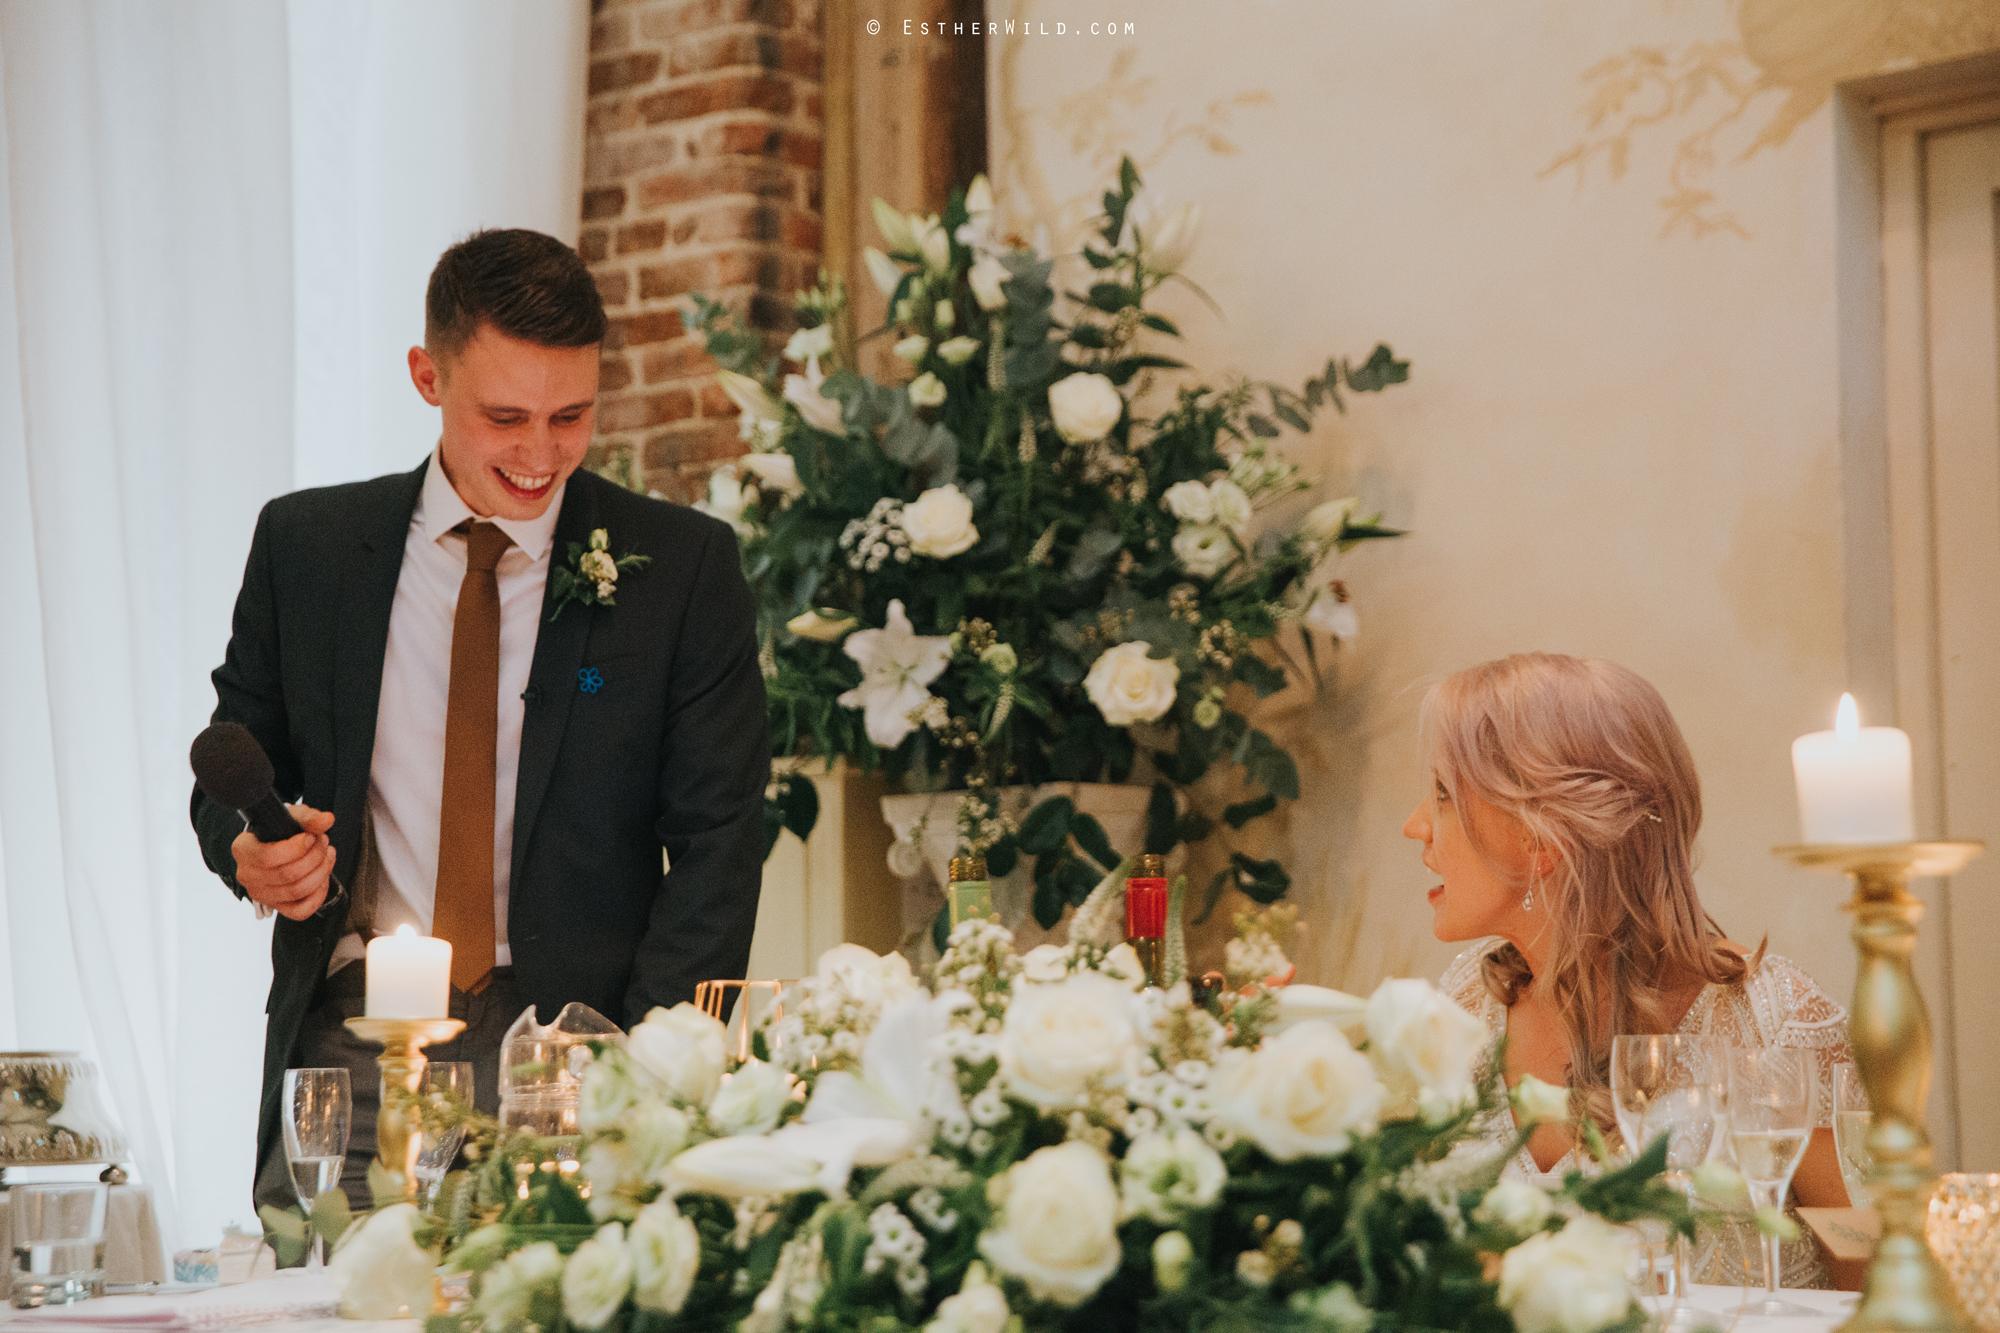 Elms_Barn_Weddings_Suffolk_Photographer_Copyright_Esther_Wild_IMG_2832.jpg